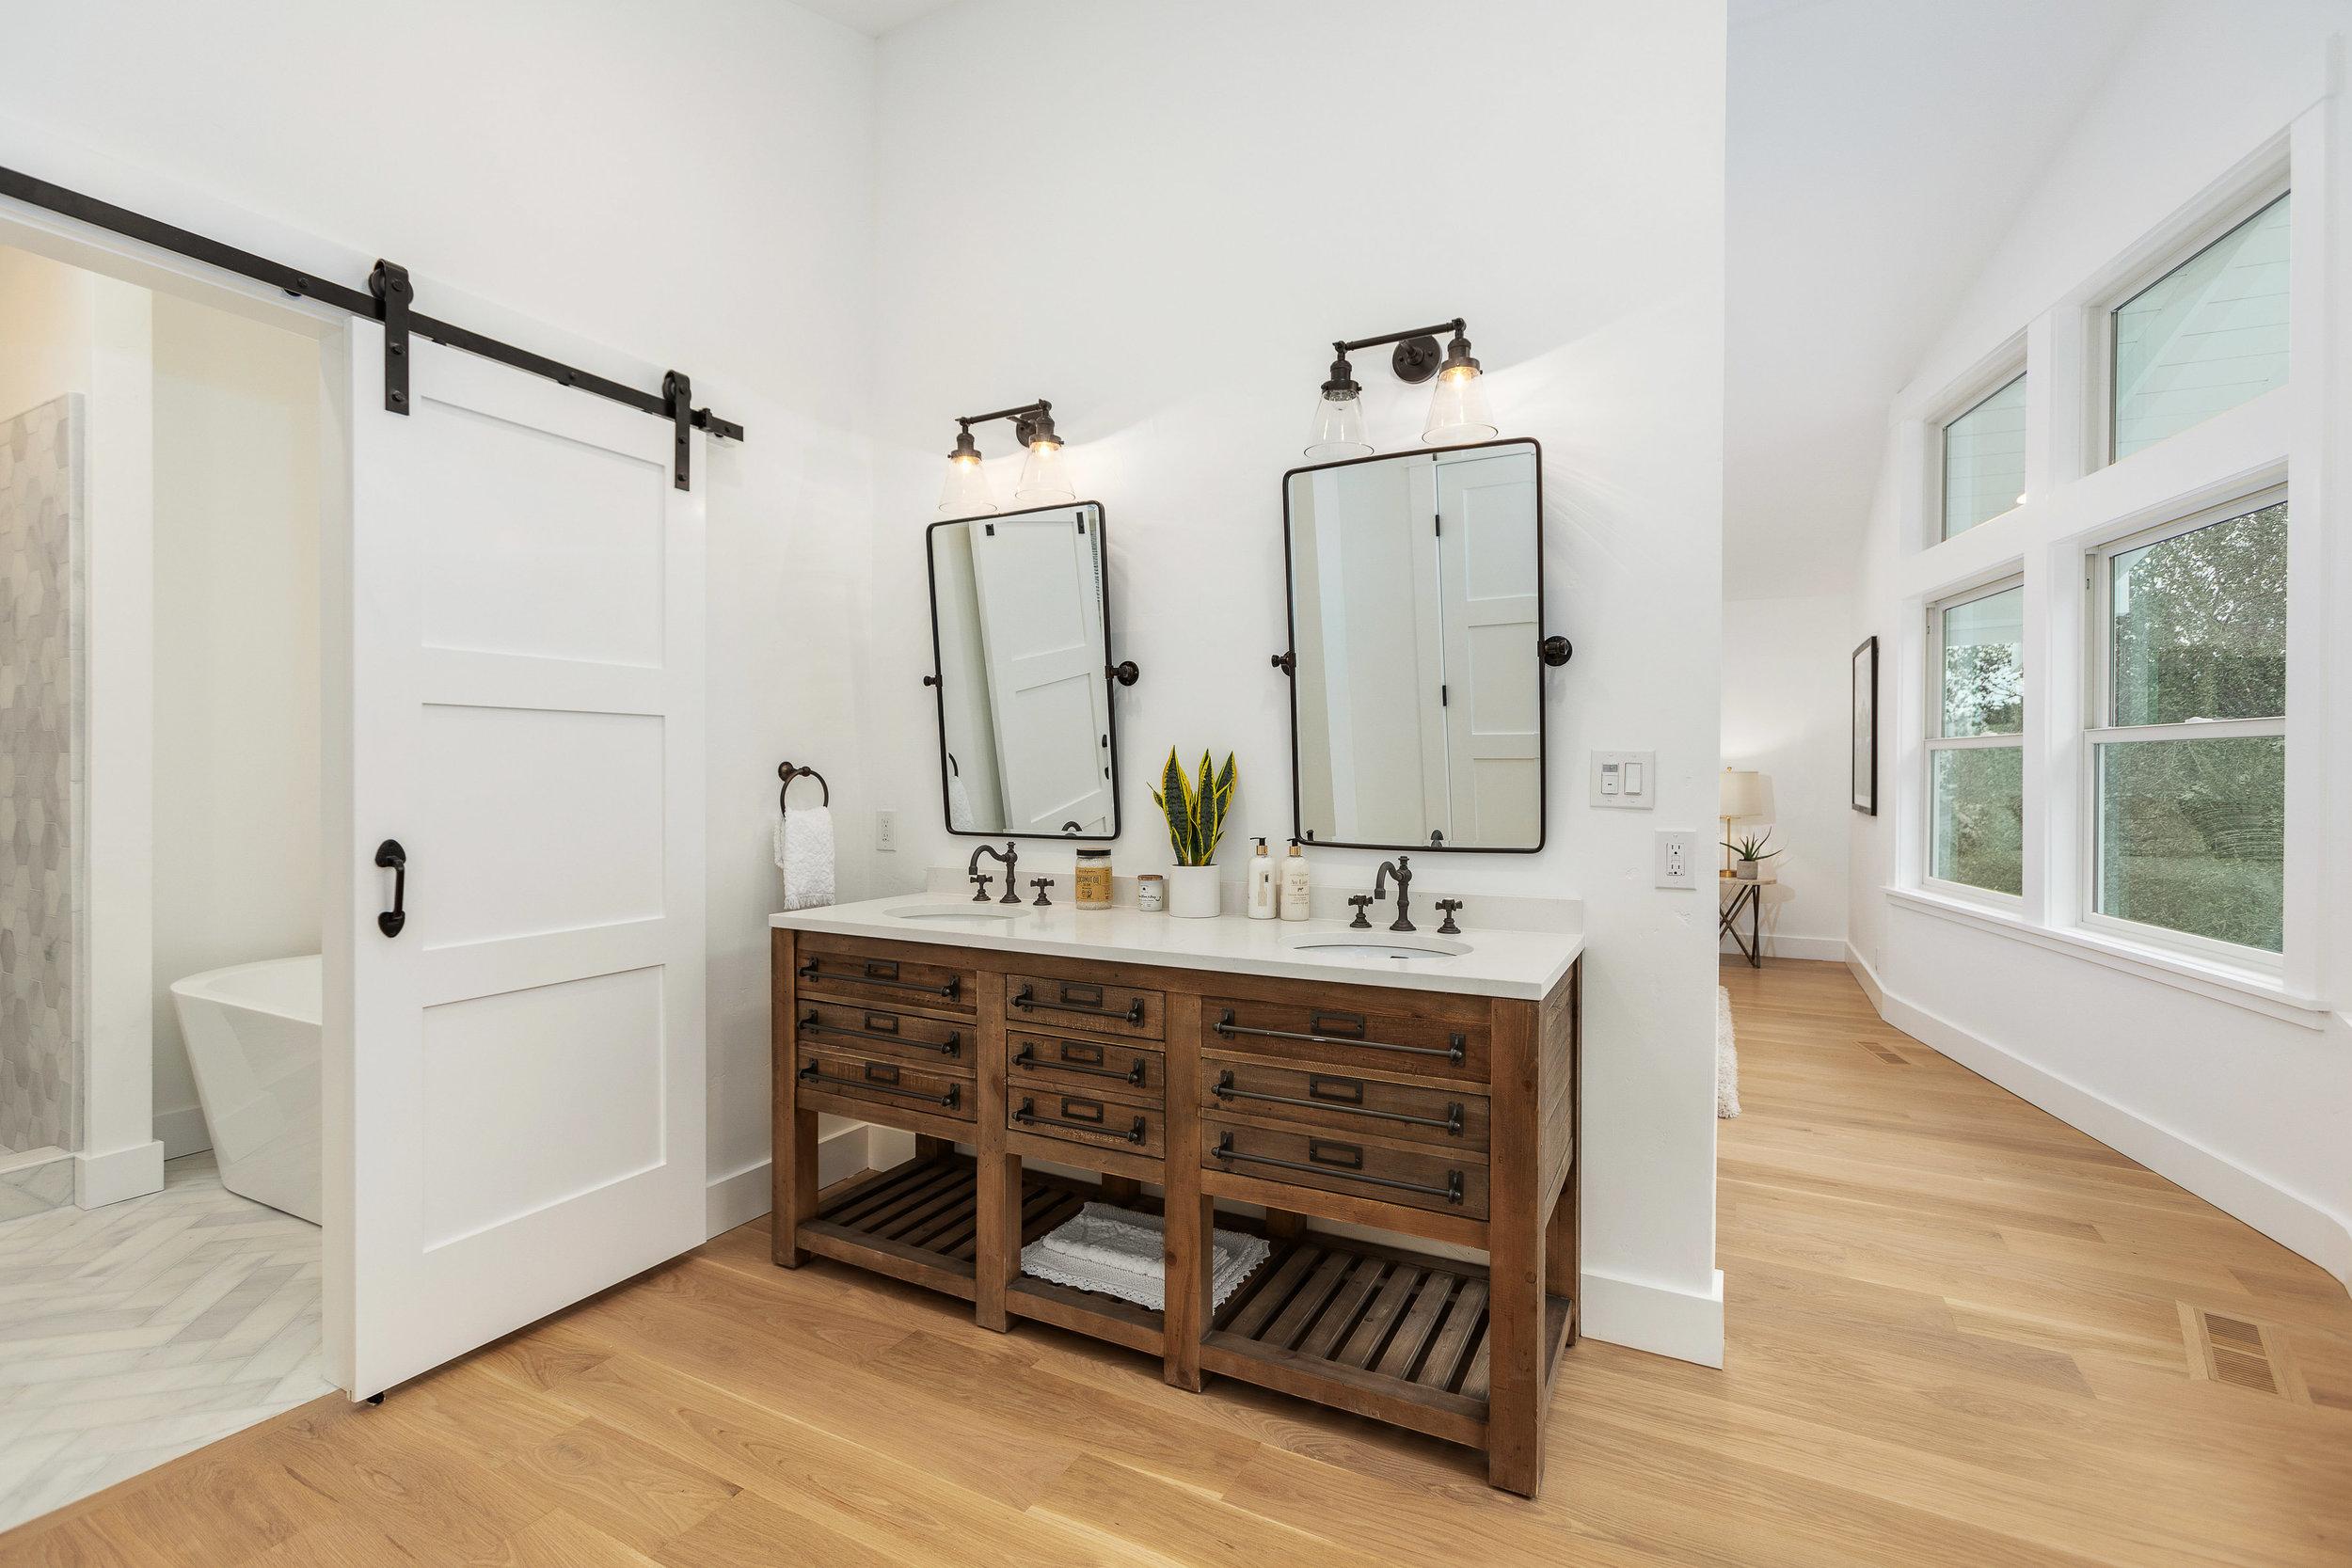 019_125-Bathroom.jpg